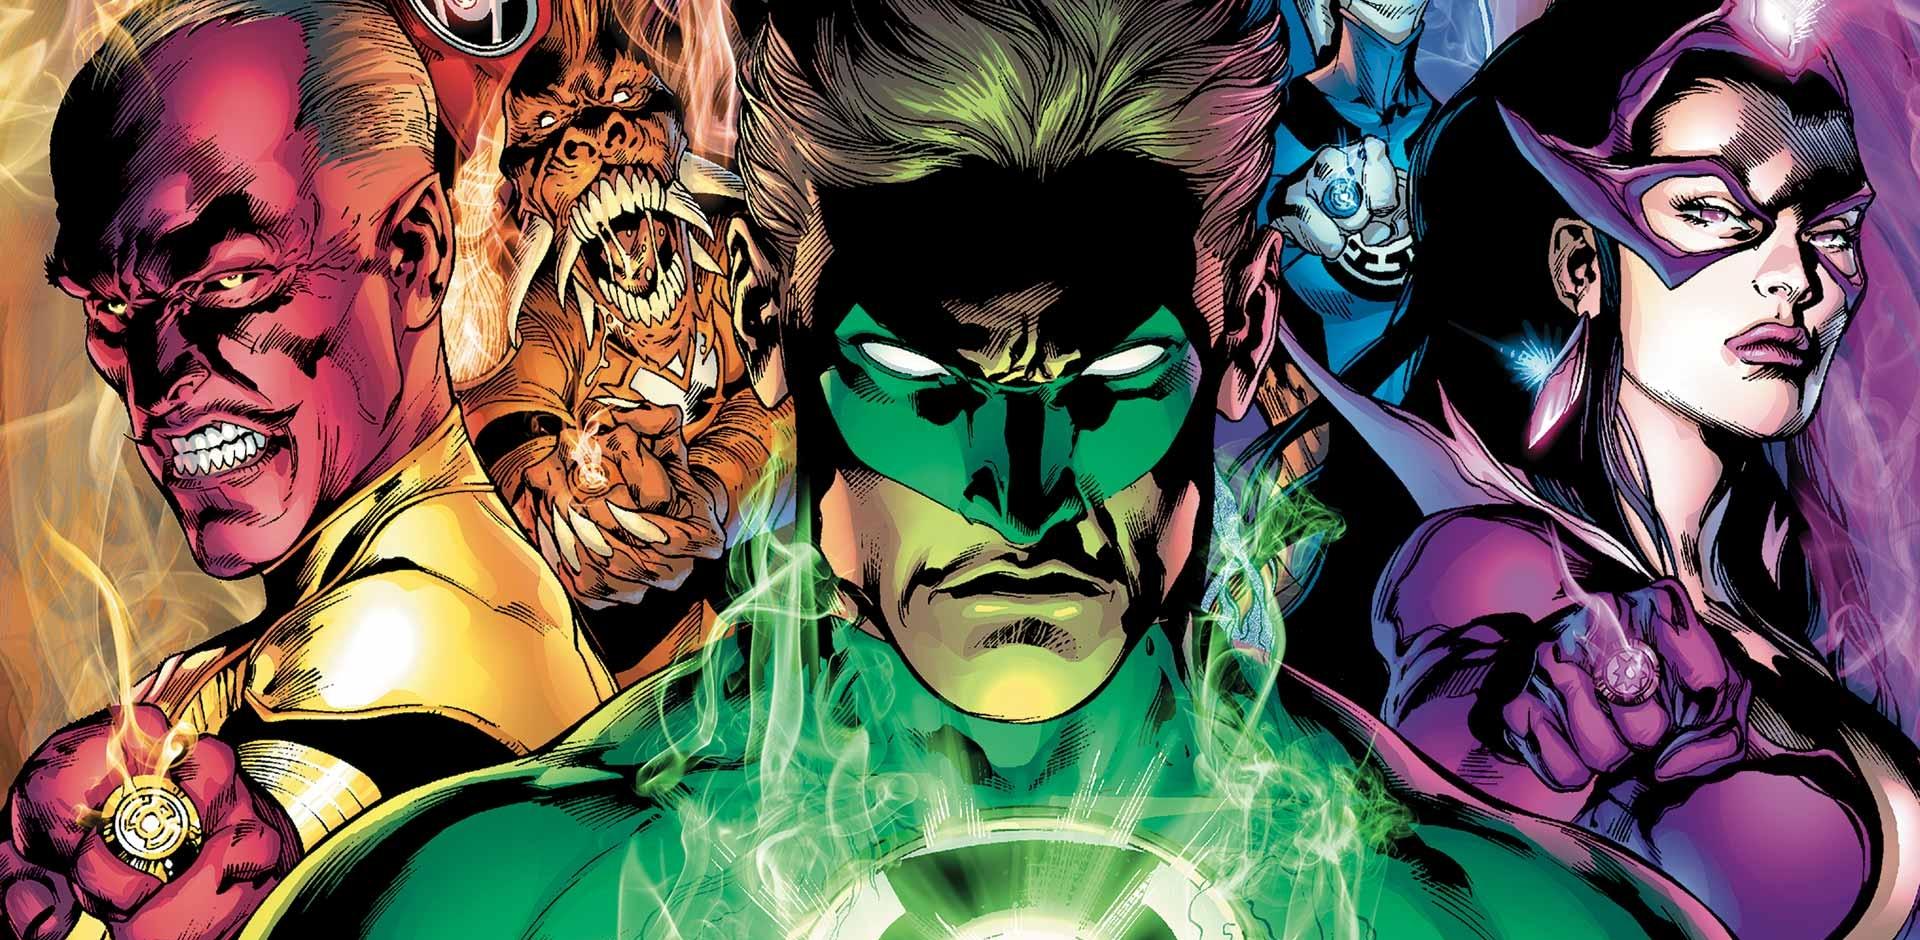 Green Lantern Johns.jpg